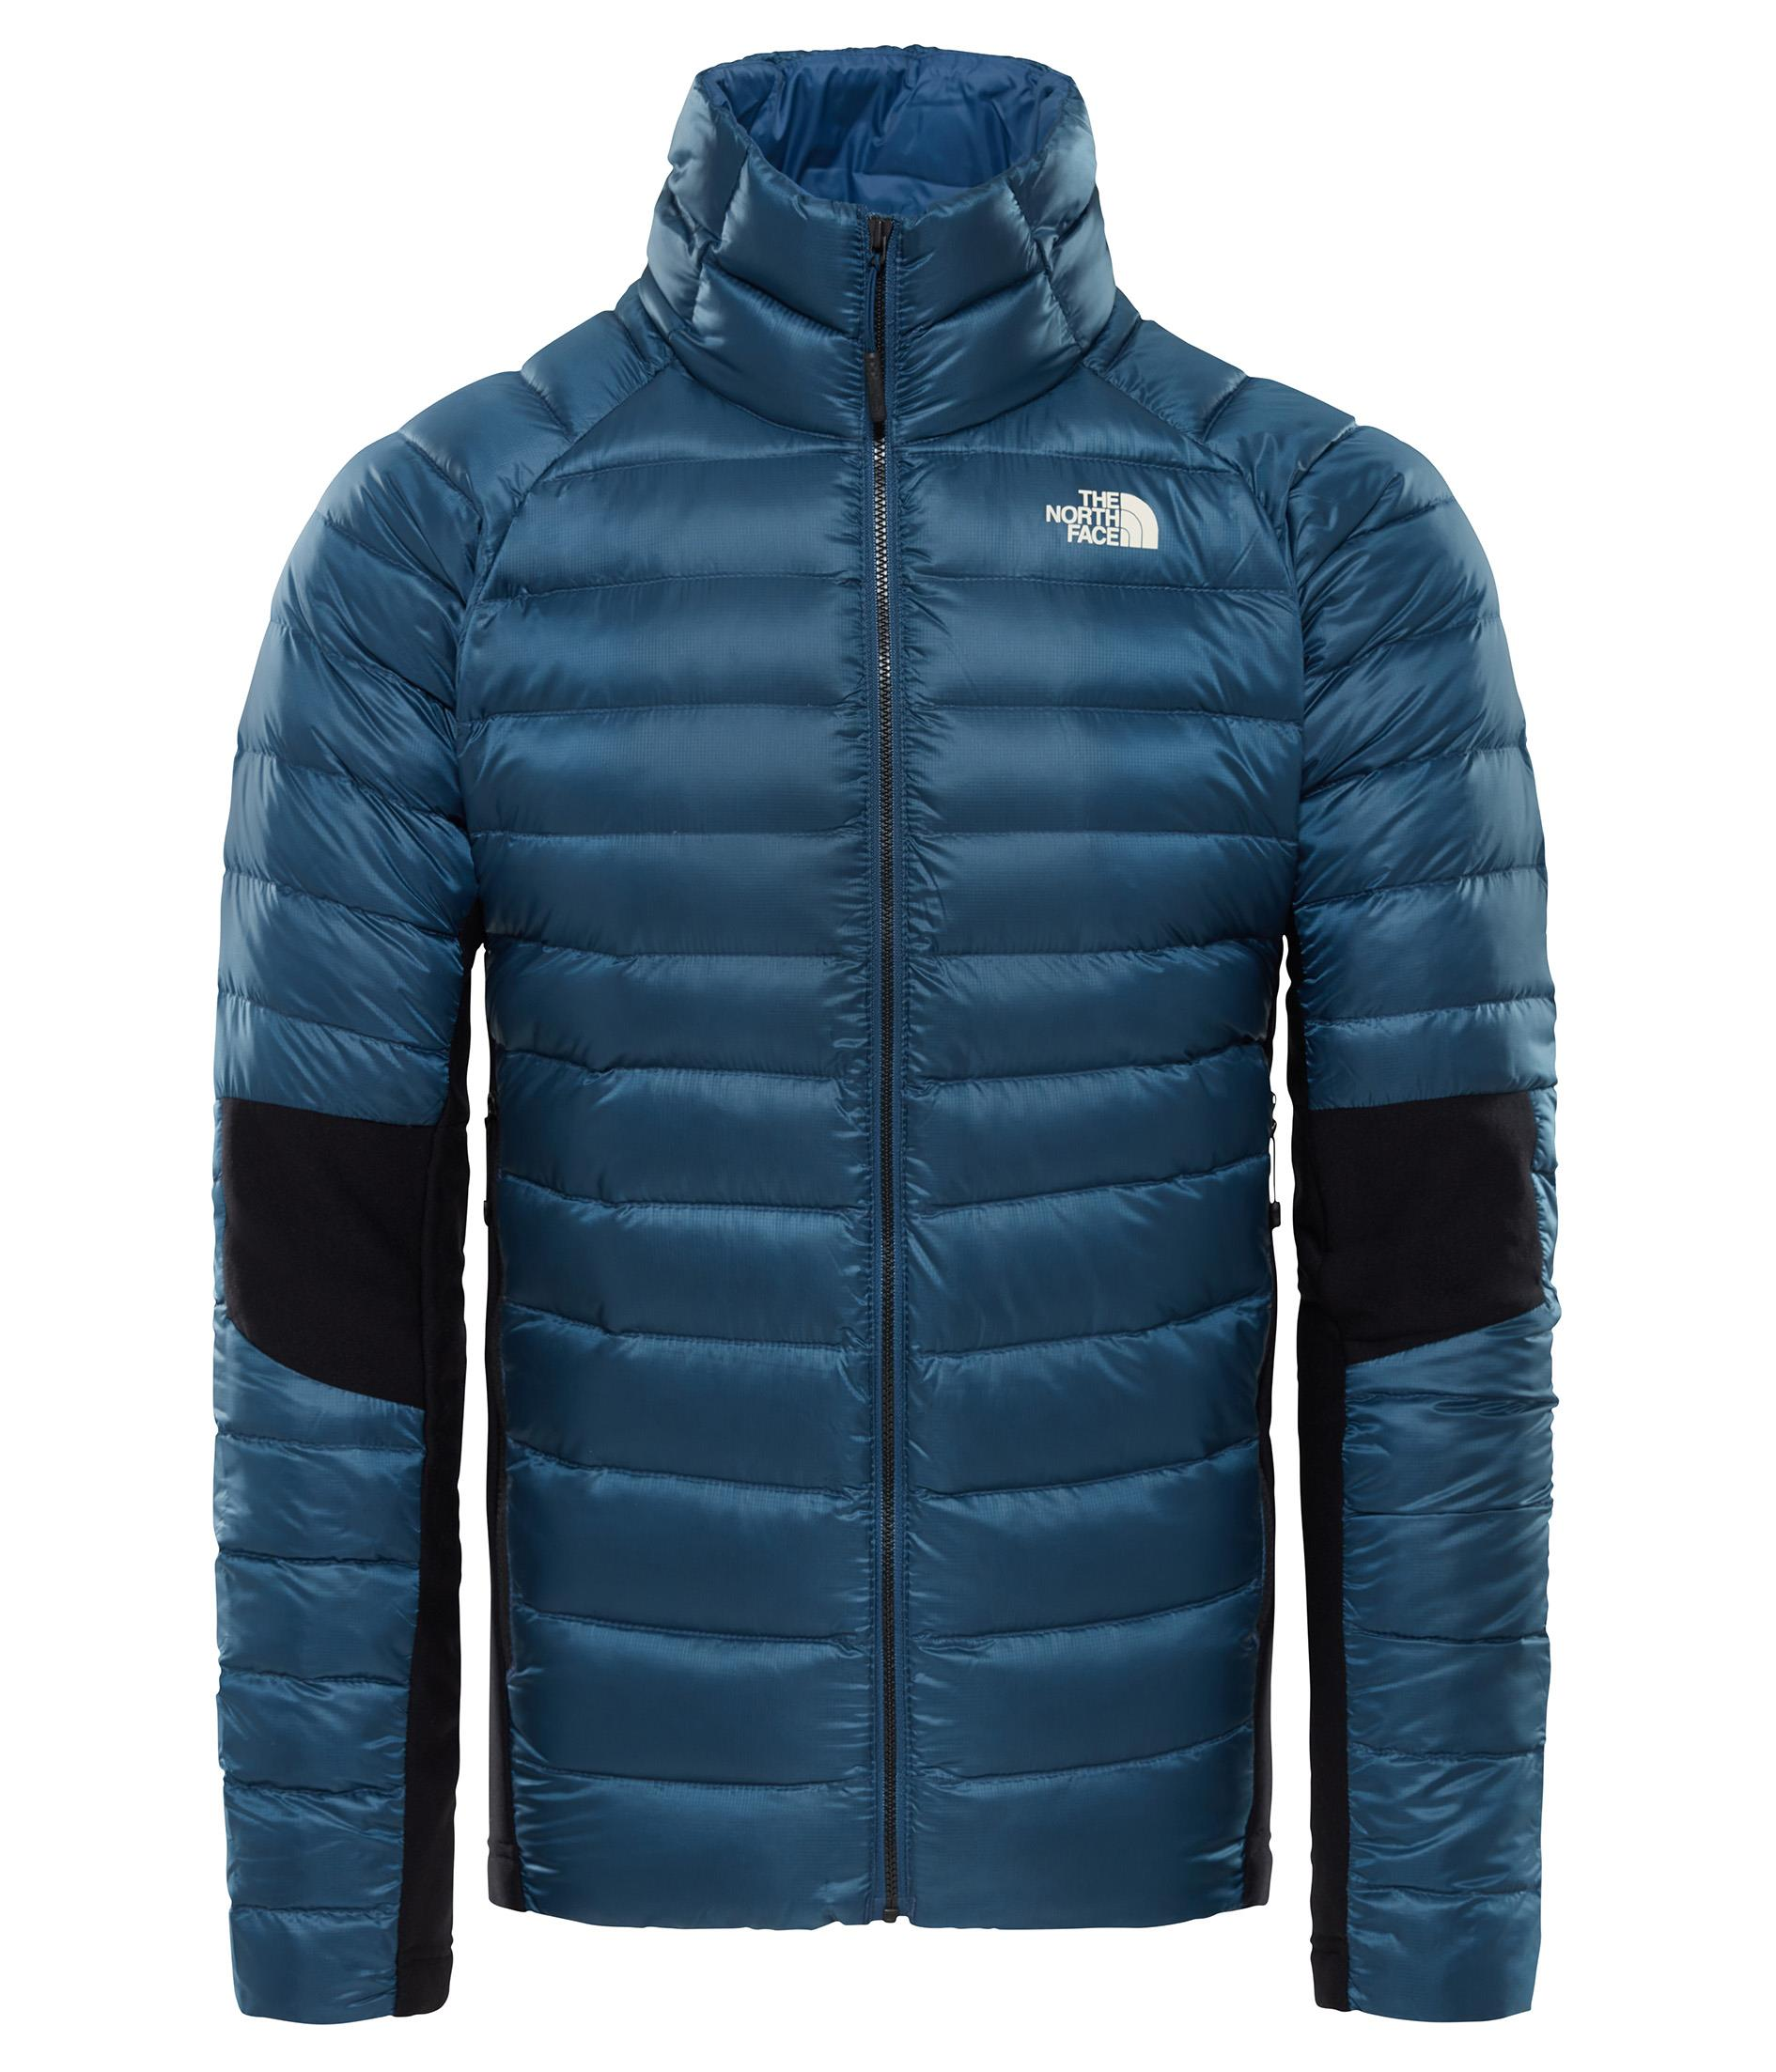 The North Face Erkek Crımptastıc Hybrıd Ceket